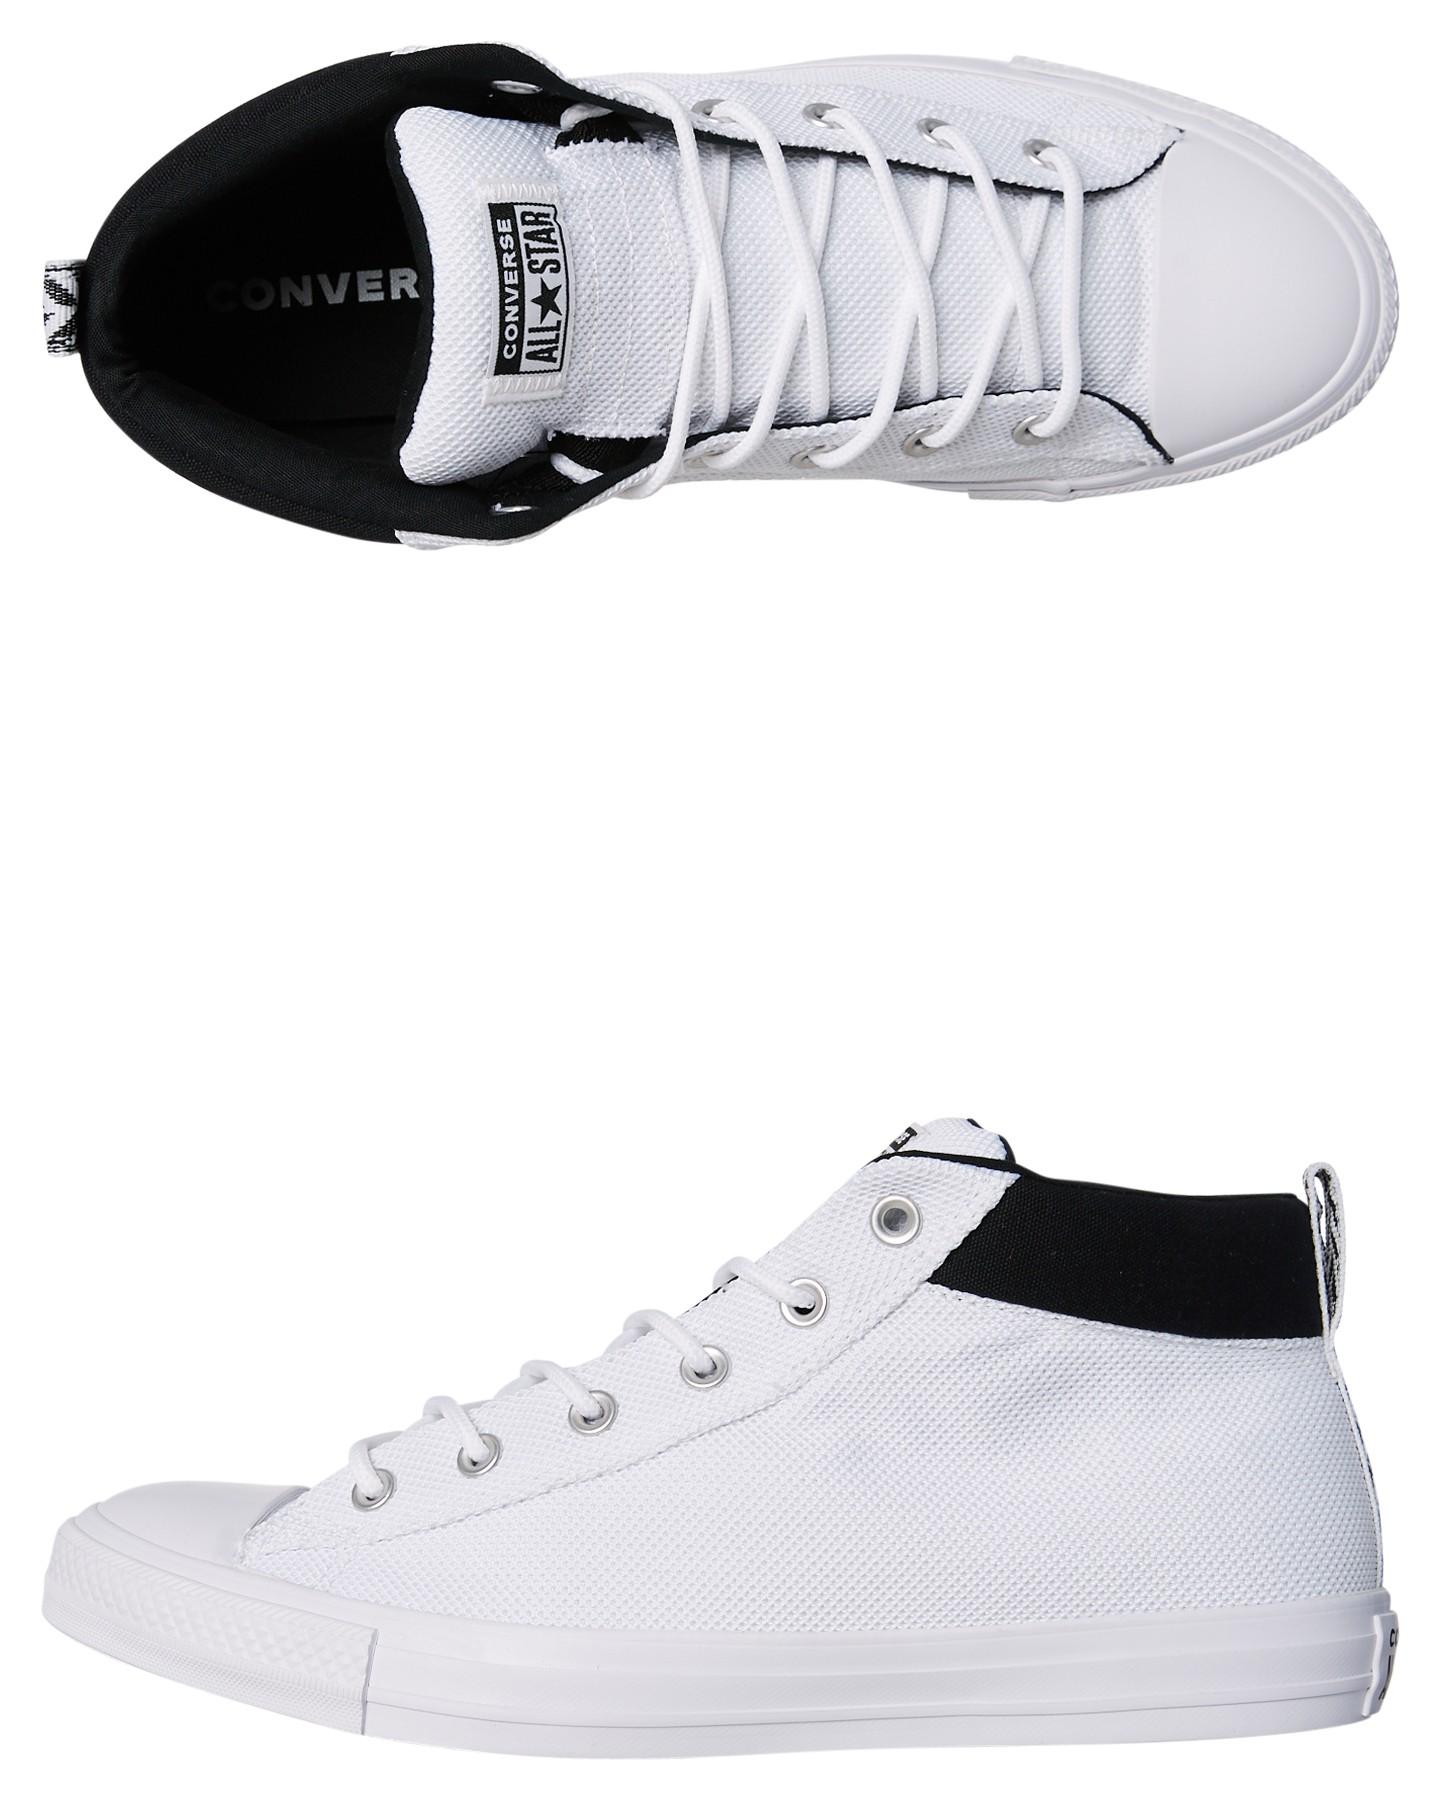 3f3c873efa7c White Black Coloured Chuck Taylor All Star Street Nylon Shoe White Black By  CONVERSE